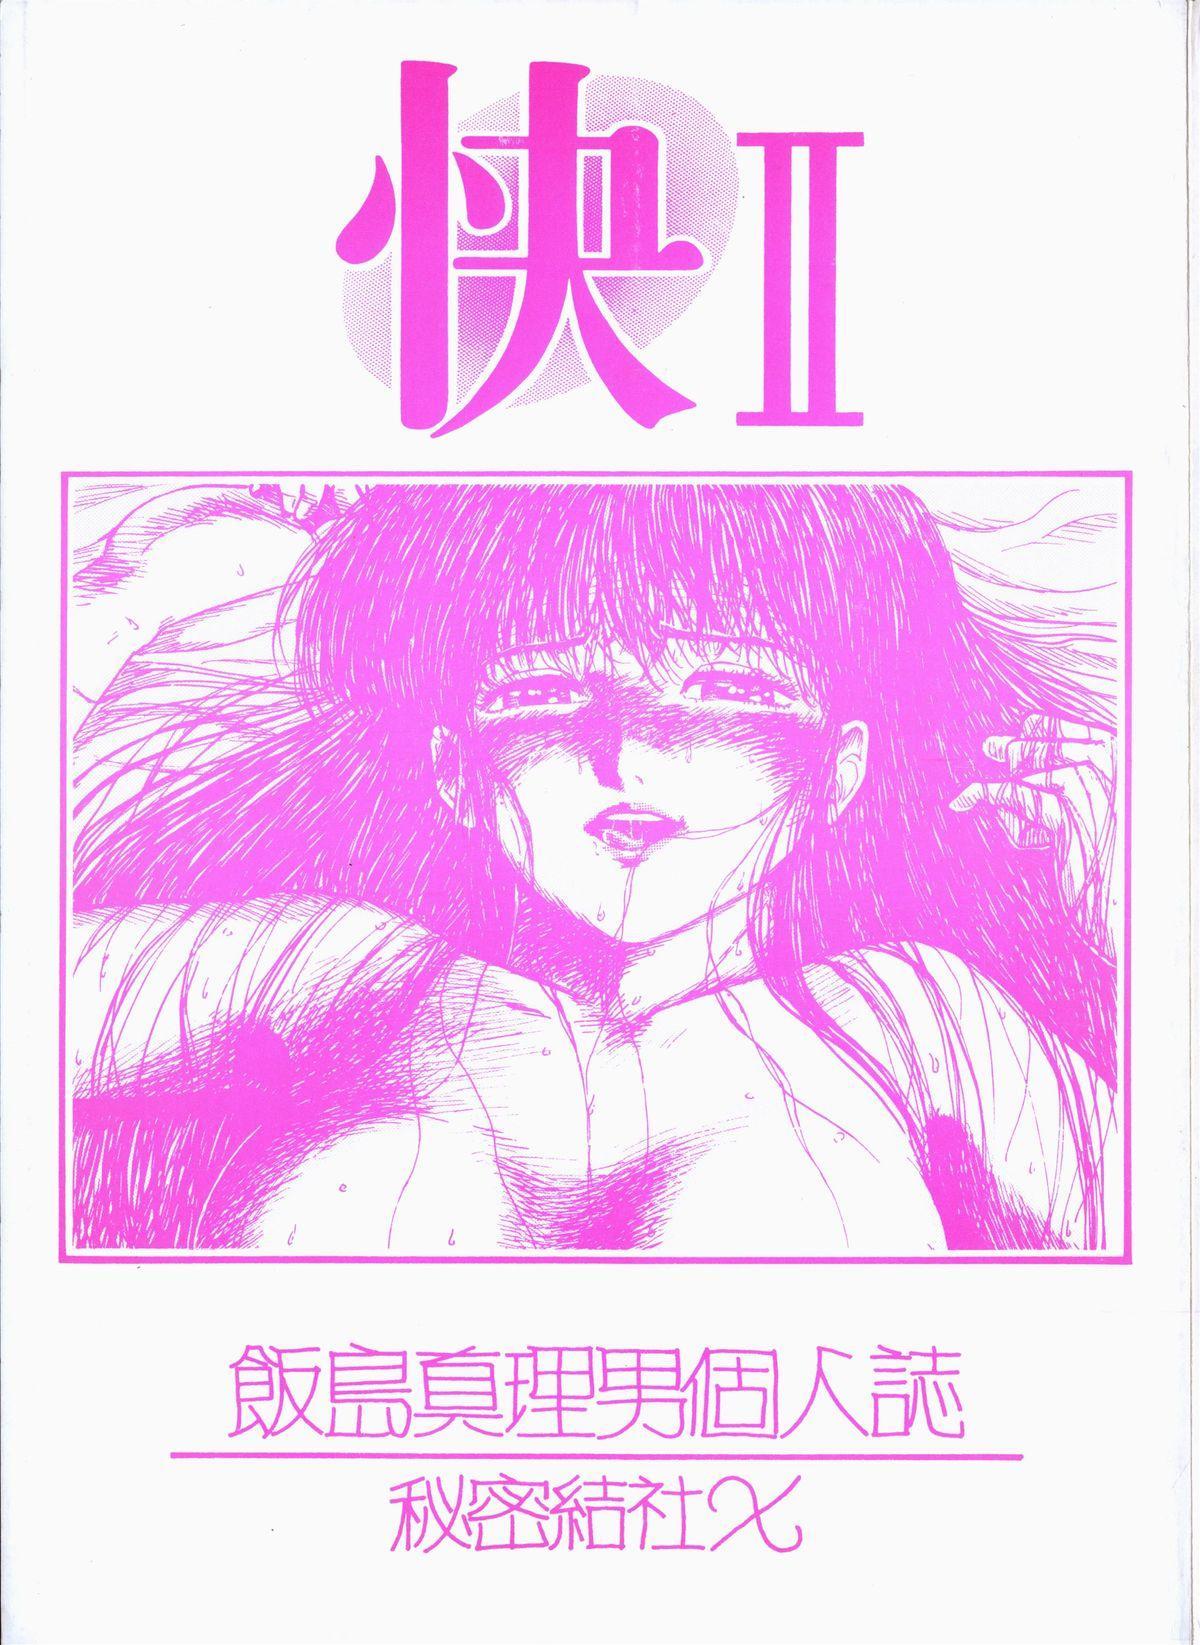 [Secret Society Chi (Iijima Mario)] Kai II - Iijima Mario Kojin-shi - (Various) 0